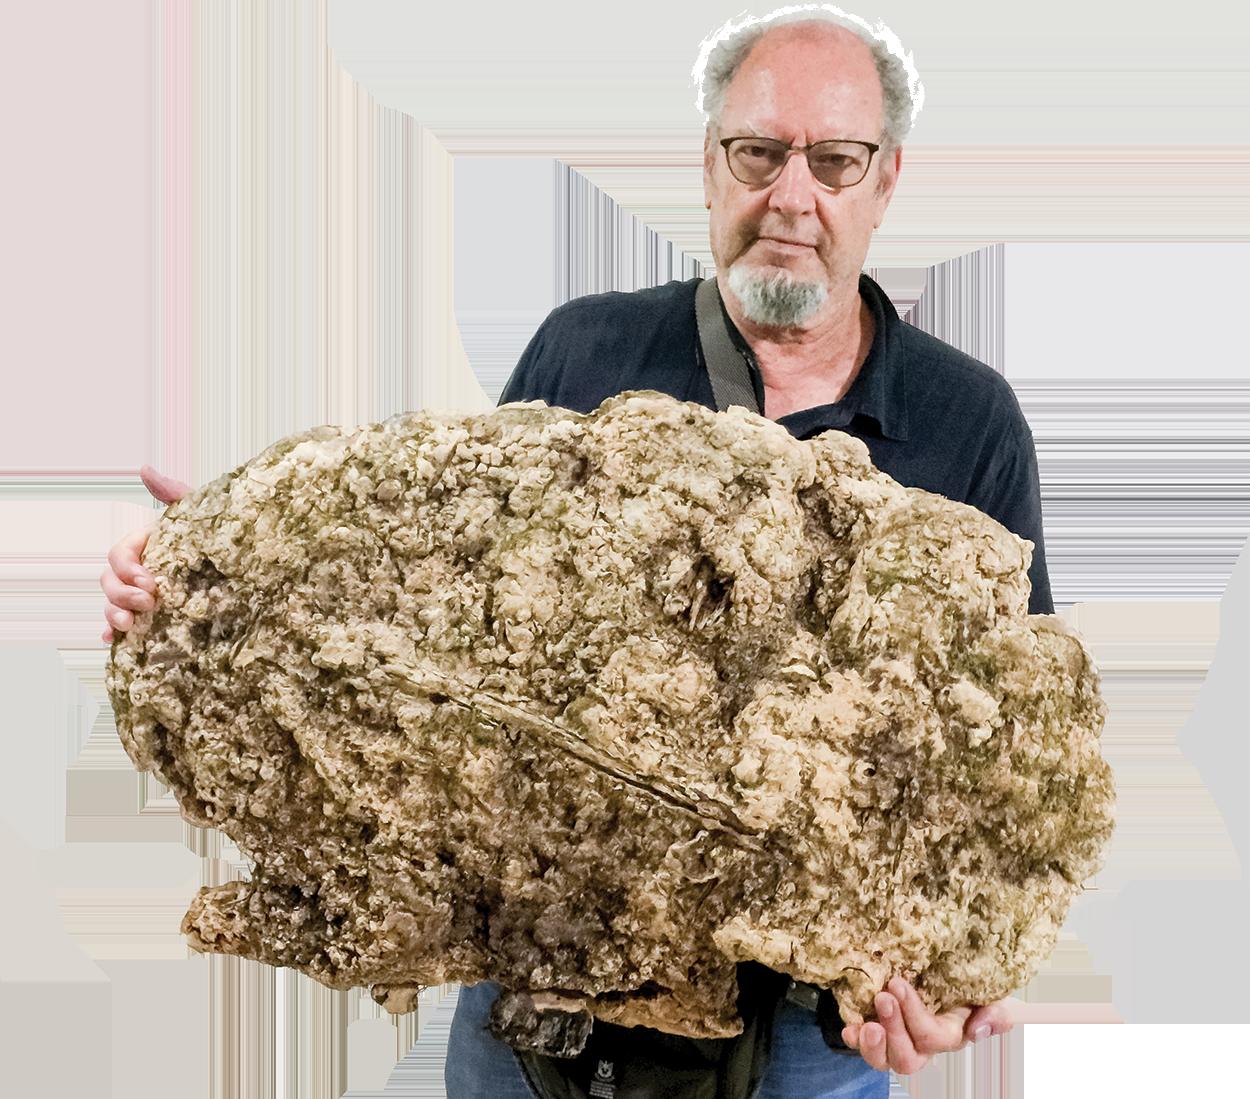 Ron holds giant Reishi